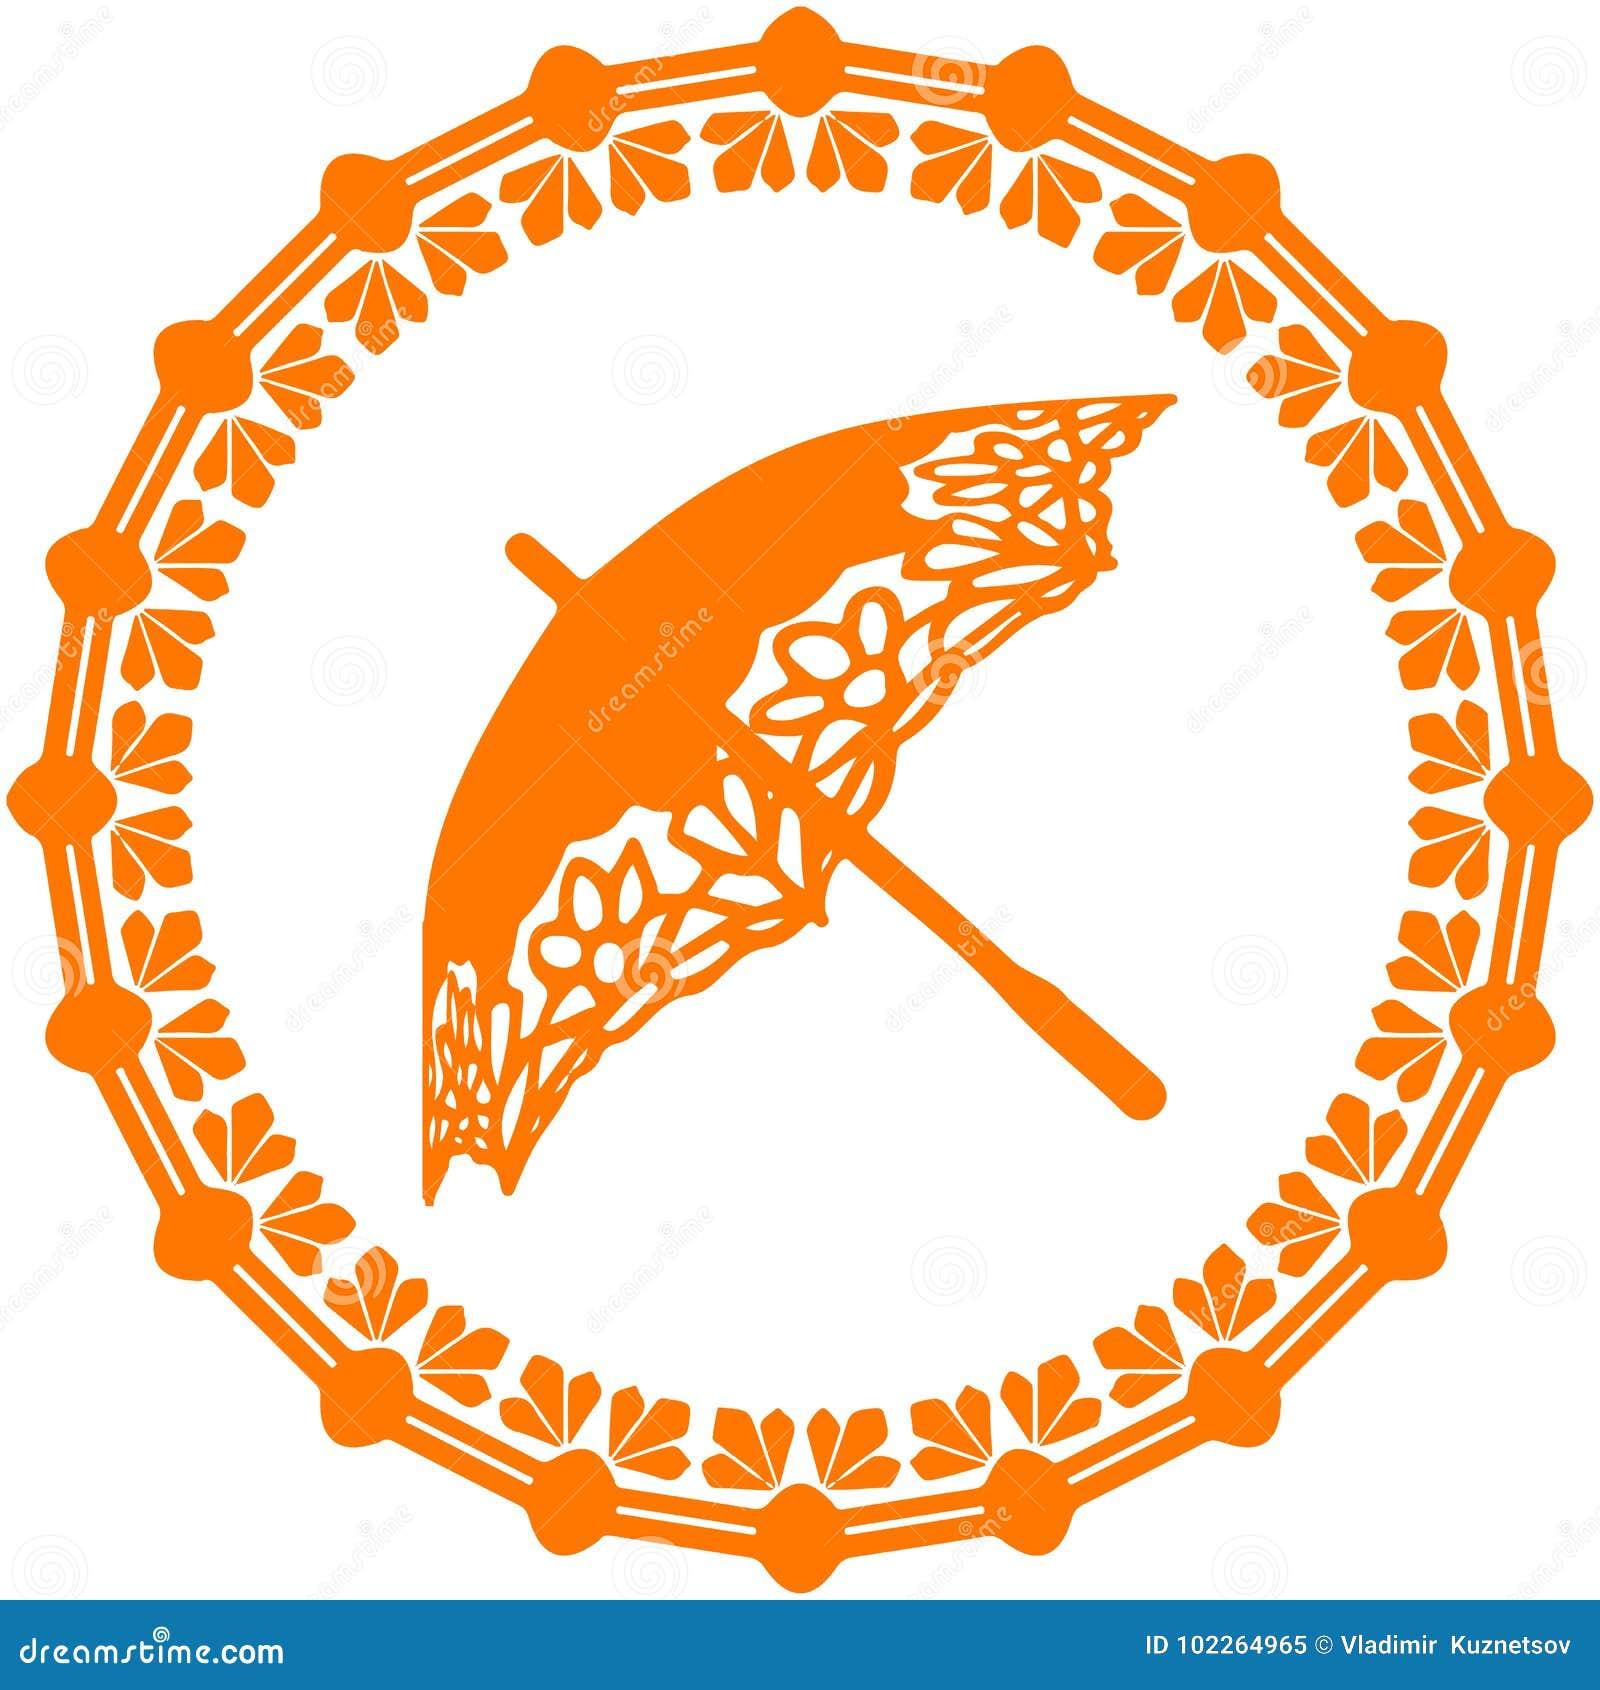 Orange Silhouette umbrella ornate, logo in a circle on a white b